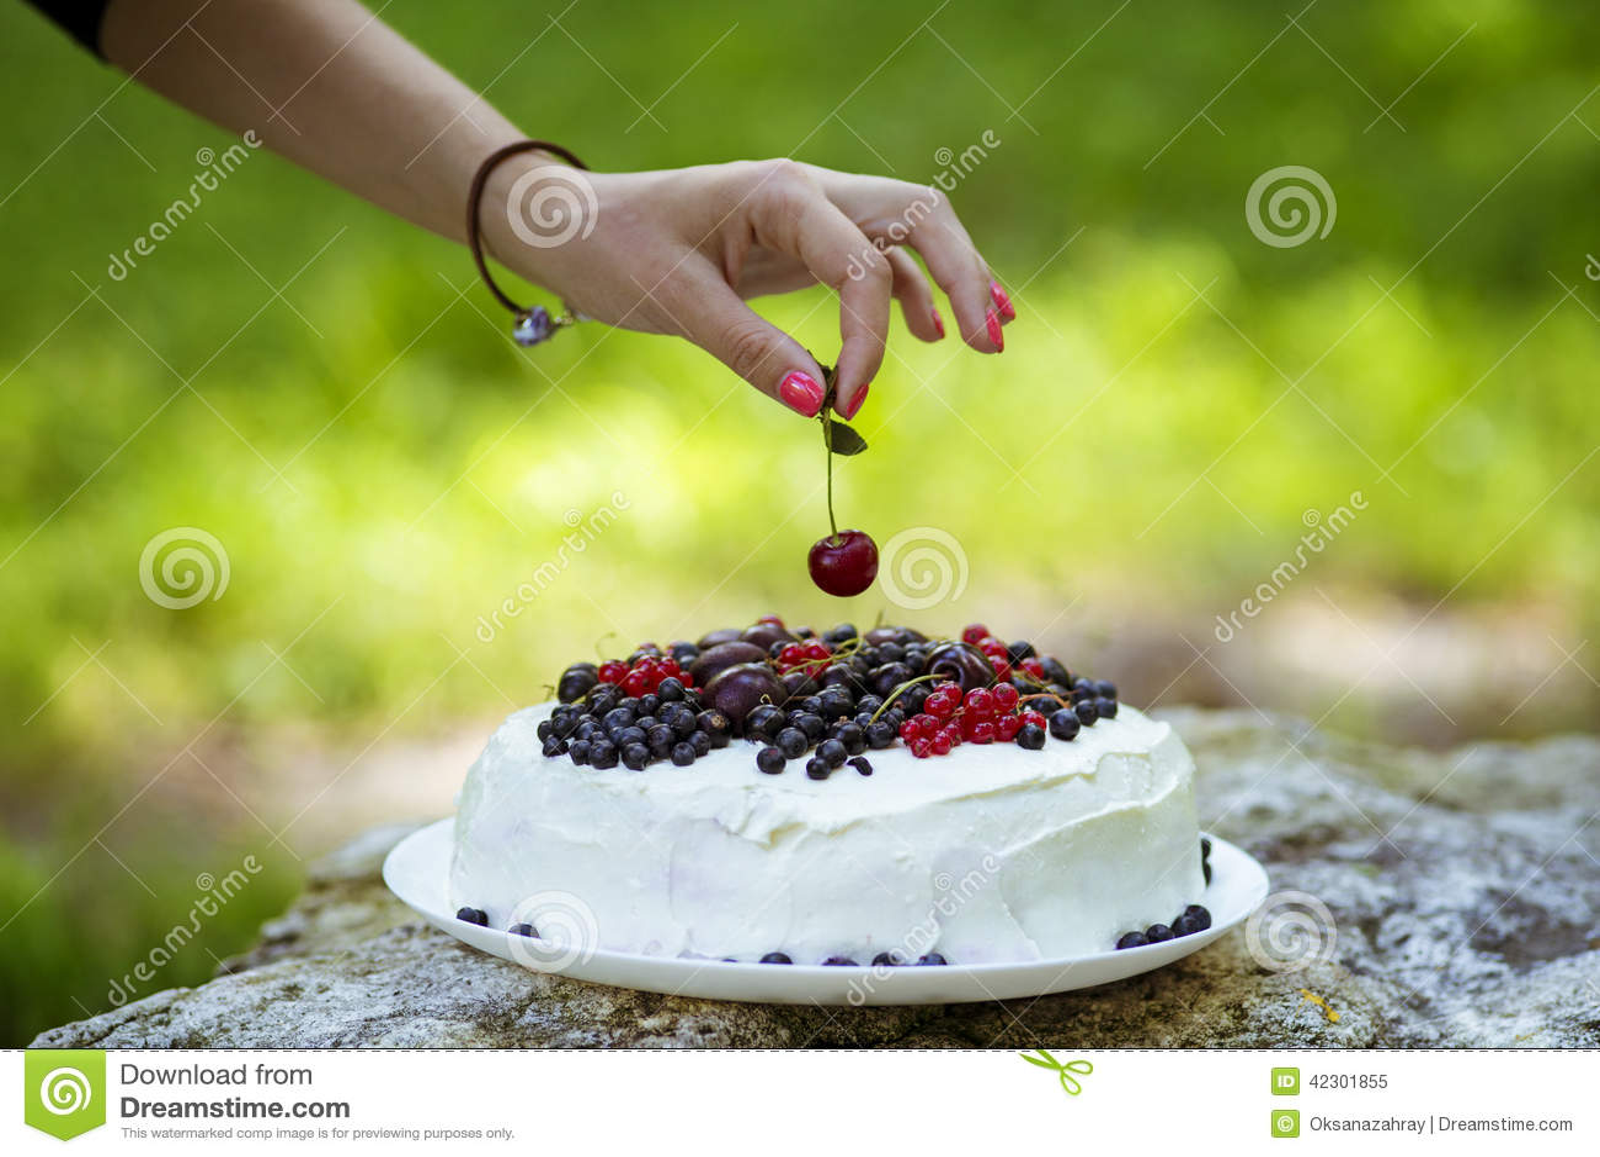 Putting Cherry On The Cake Stock Photo Image 42301855